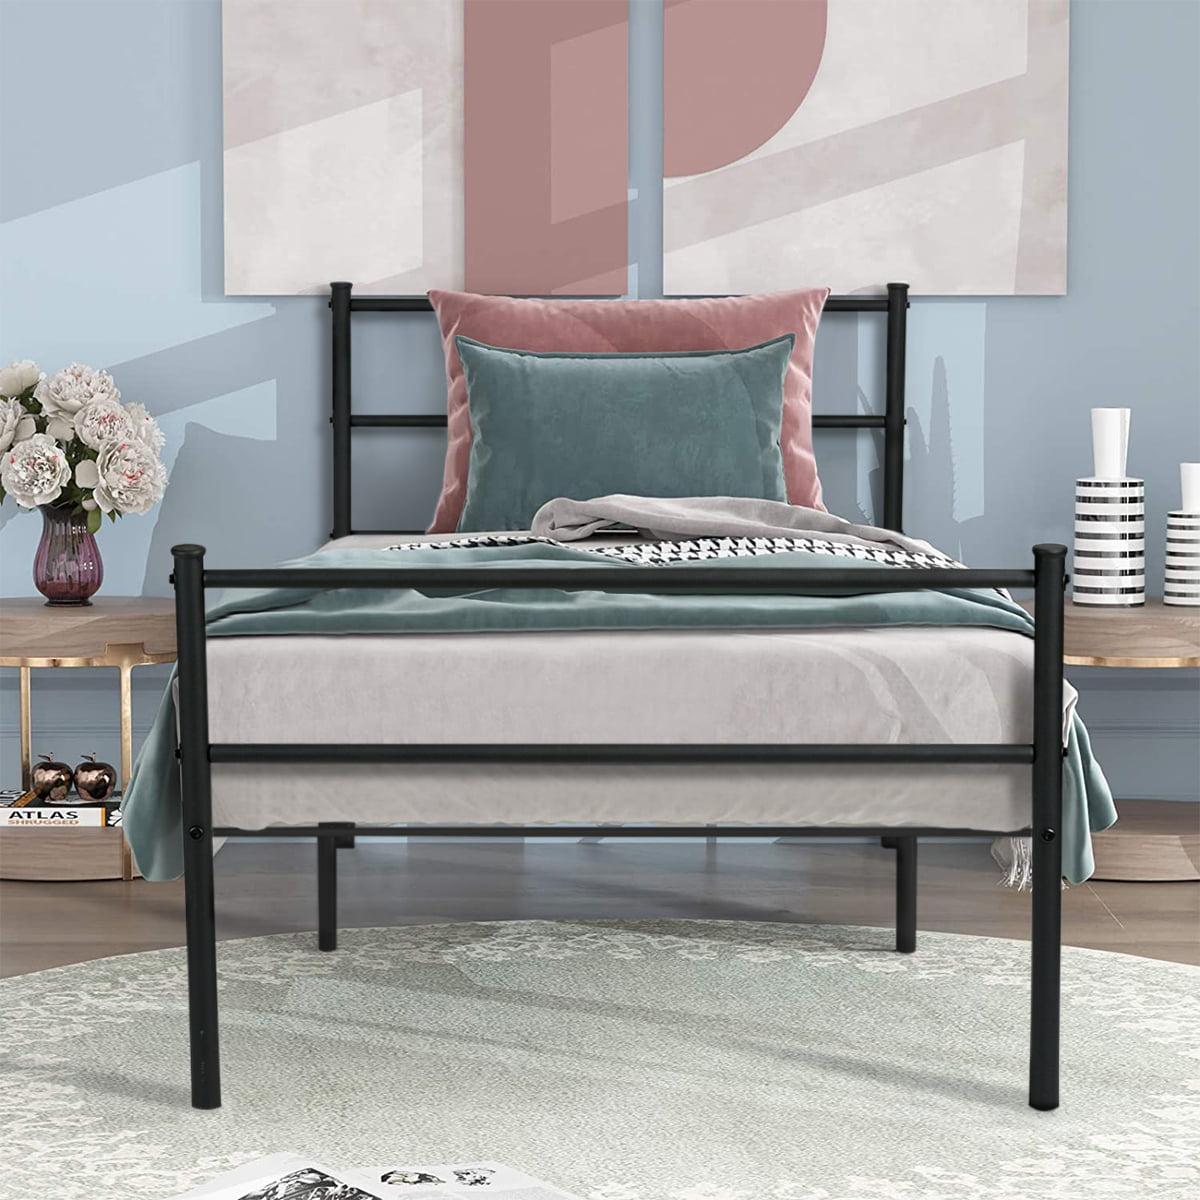 Aingoo Bed Frame Twin Size Metal Platform Bed With Two Headboards Black Walmart Com Walmart Com